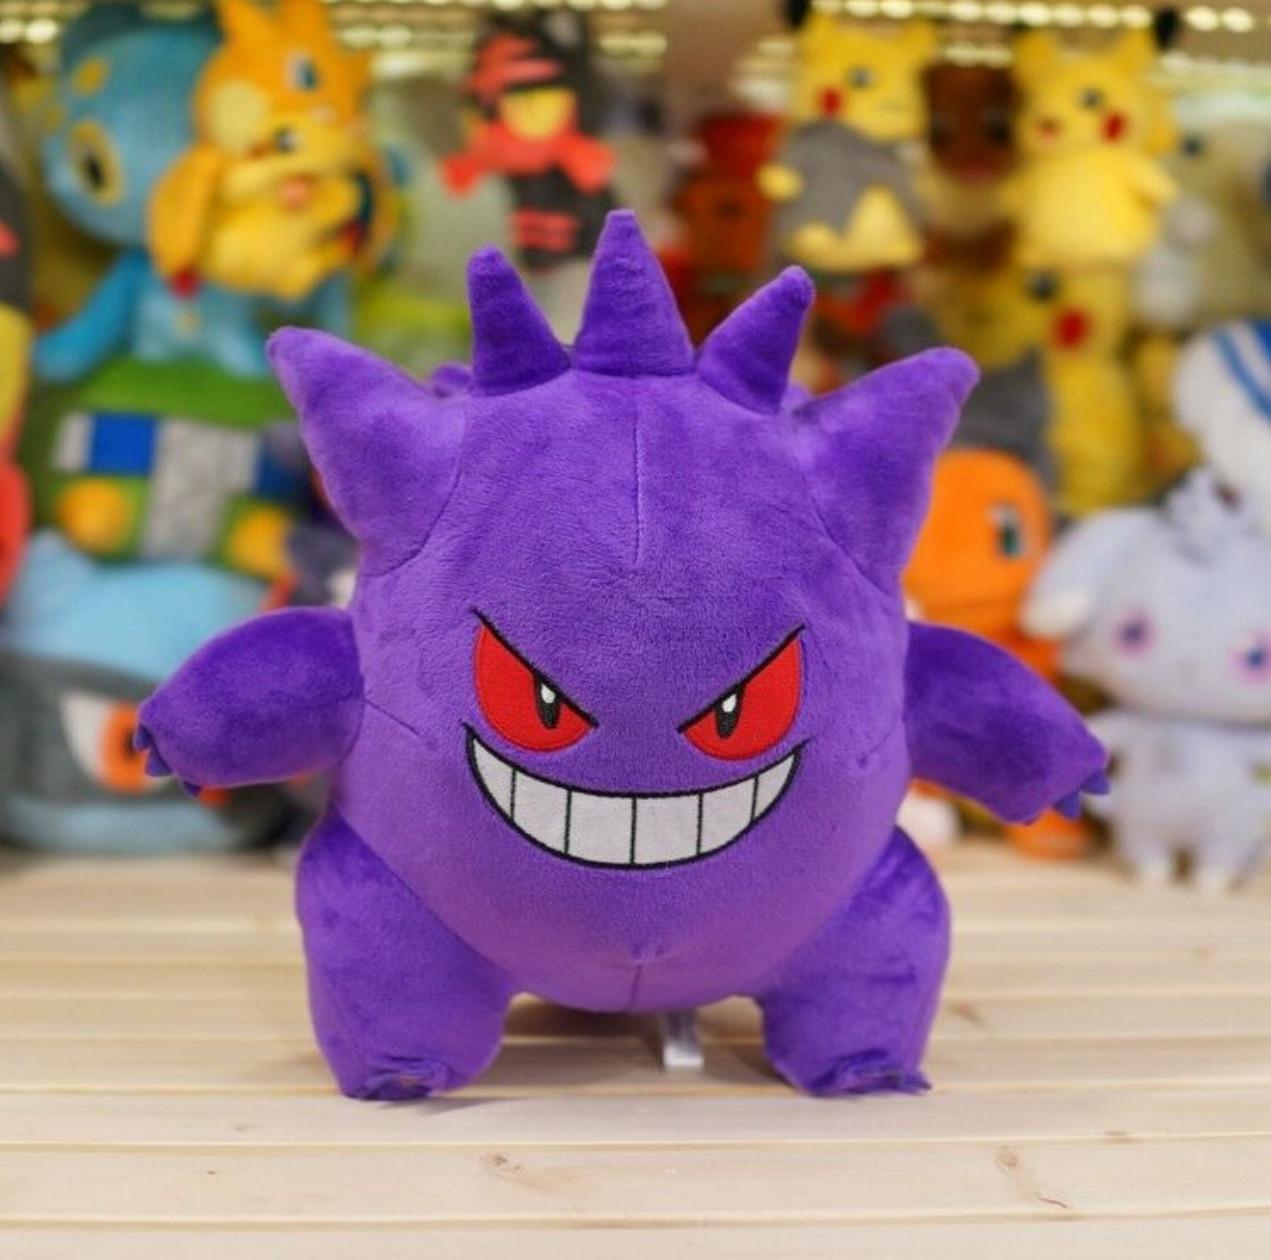 "Pokemon XY Gengar Gangar Plush Toy Ghost Haunter Stuffed Animal Pillow Doll 12/"""